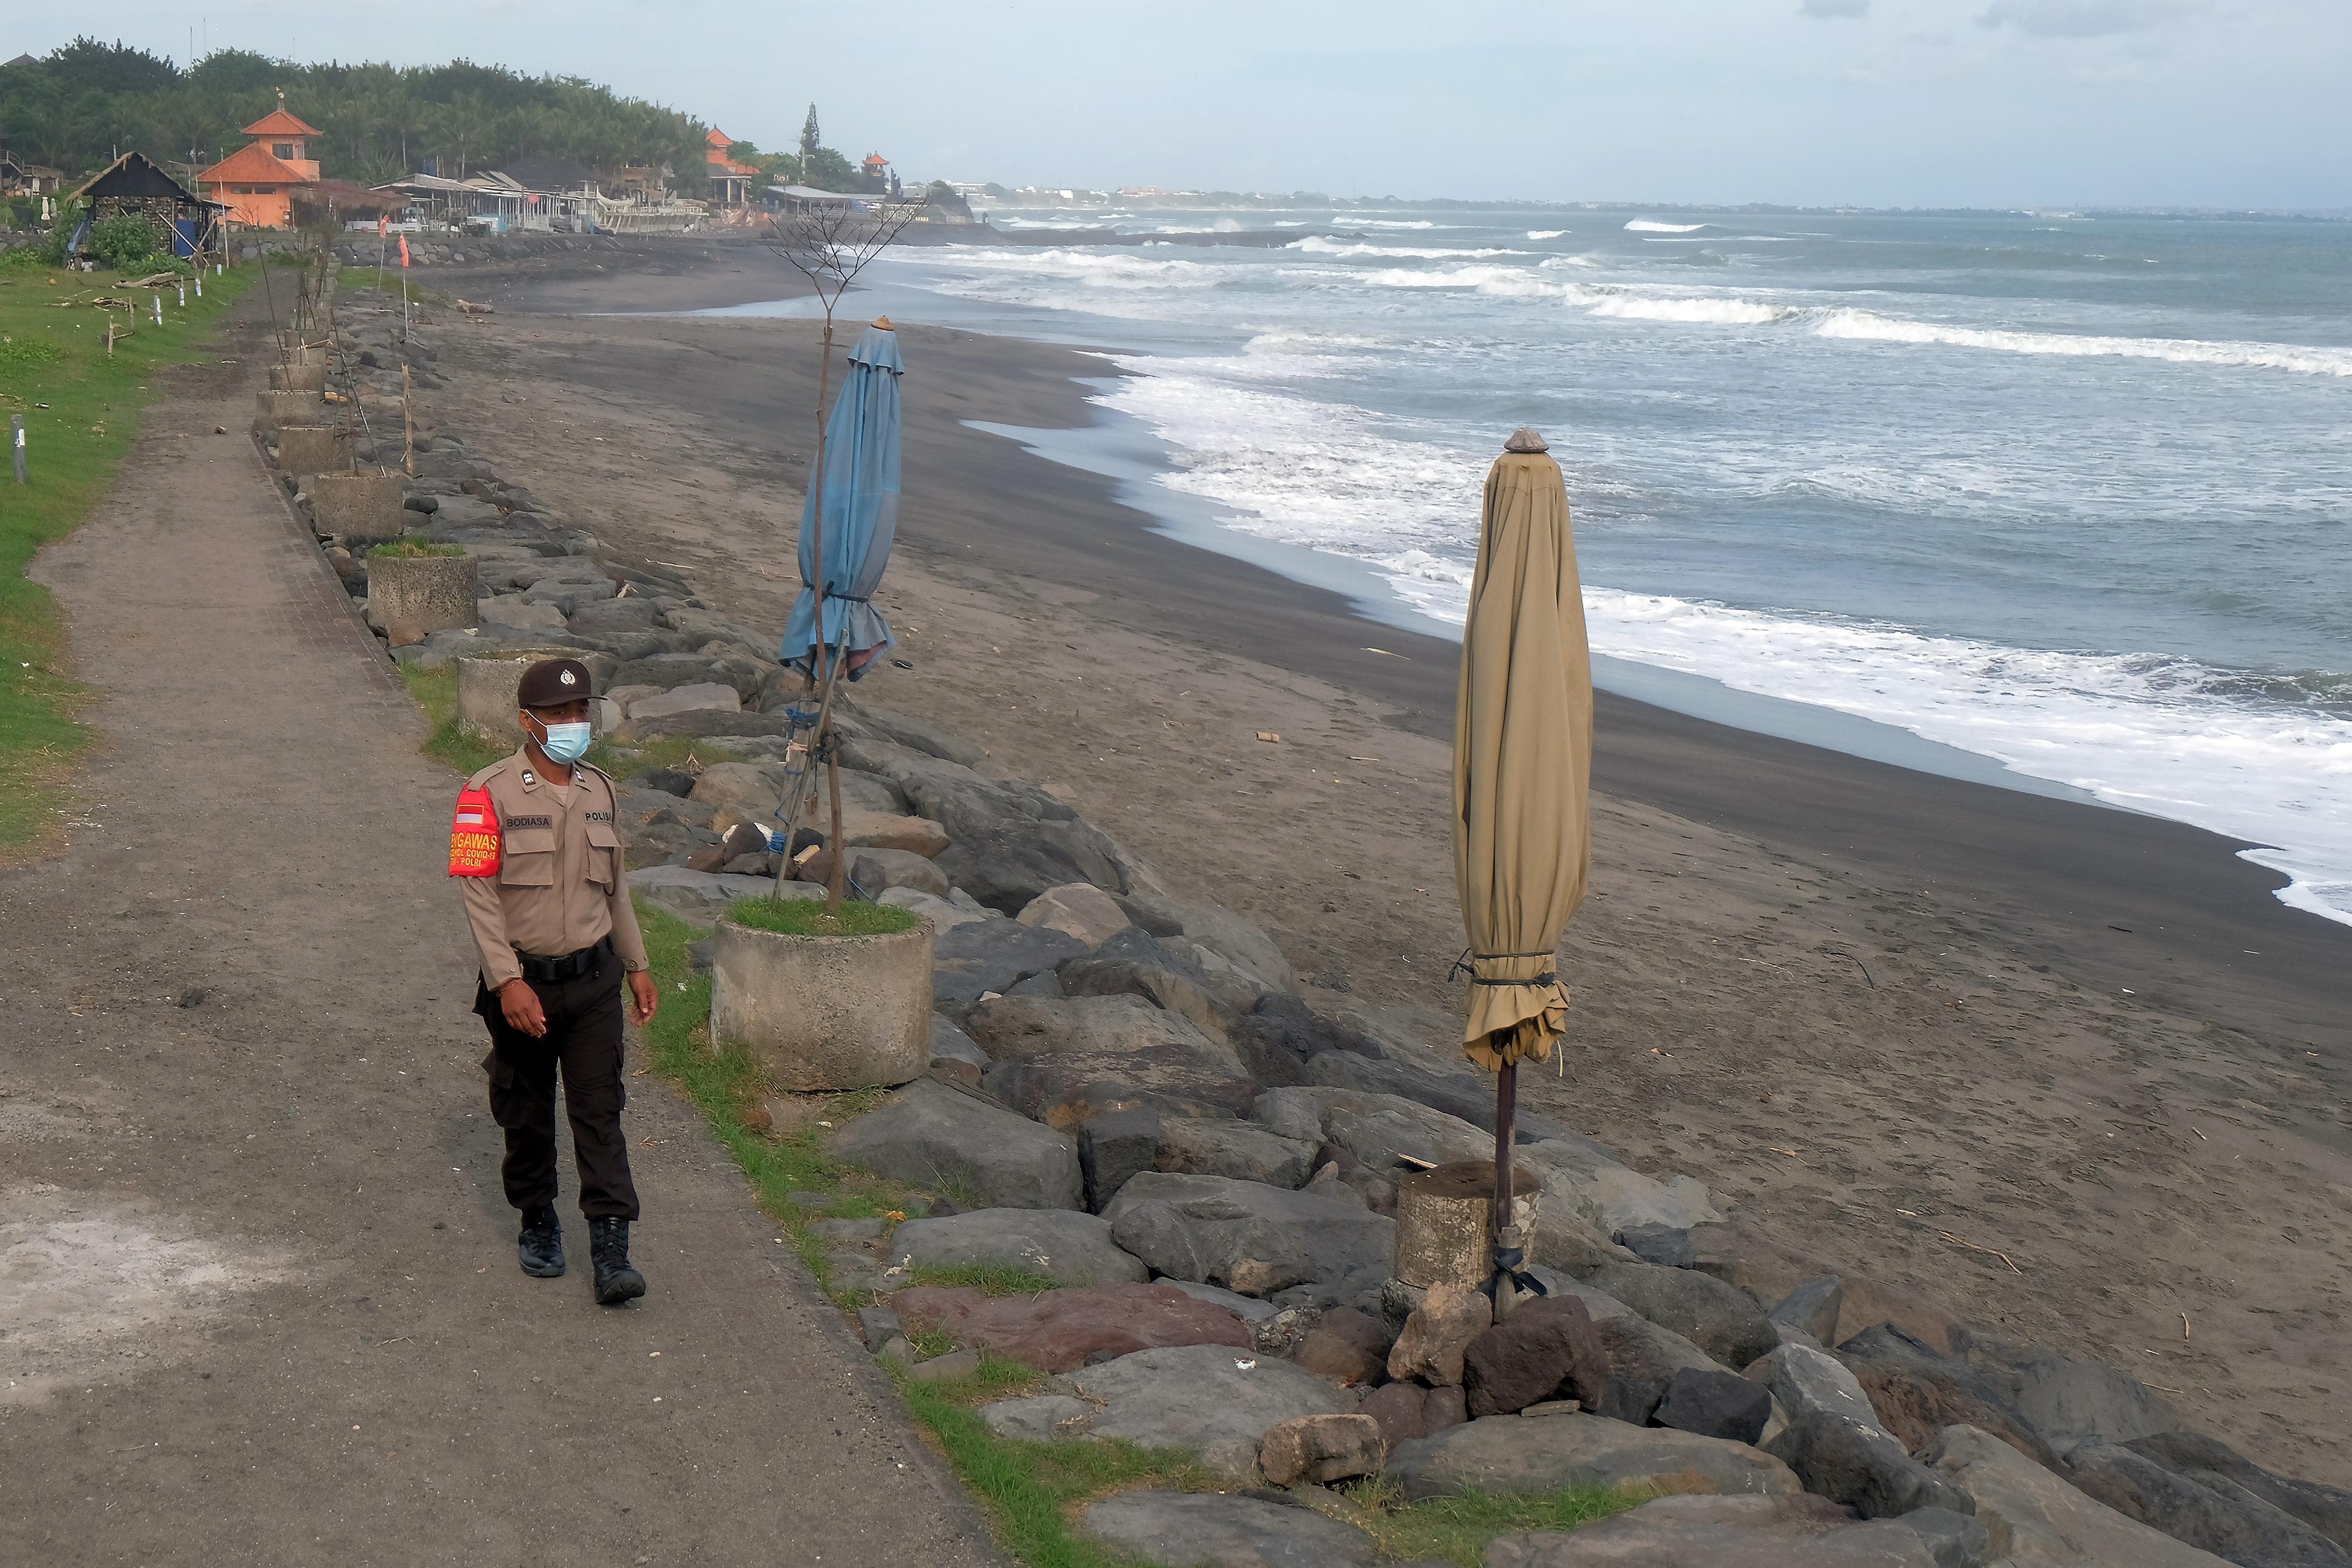 A police officer patrols at an empty beach amid the coronavirus disease (COVID-19) outbreak, in Badung, Bali, Indonesia, July 17, 2021, in this photo taken by Antara Foto. Antara Foto/Nyoman Hendra Wibowo/ via REUTERS